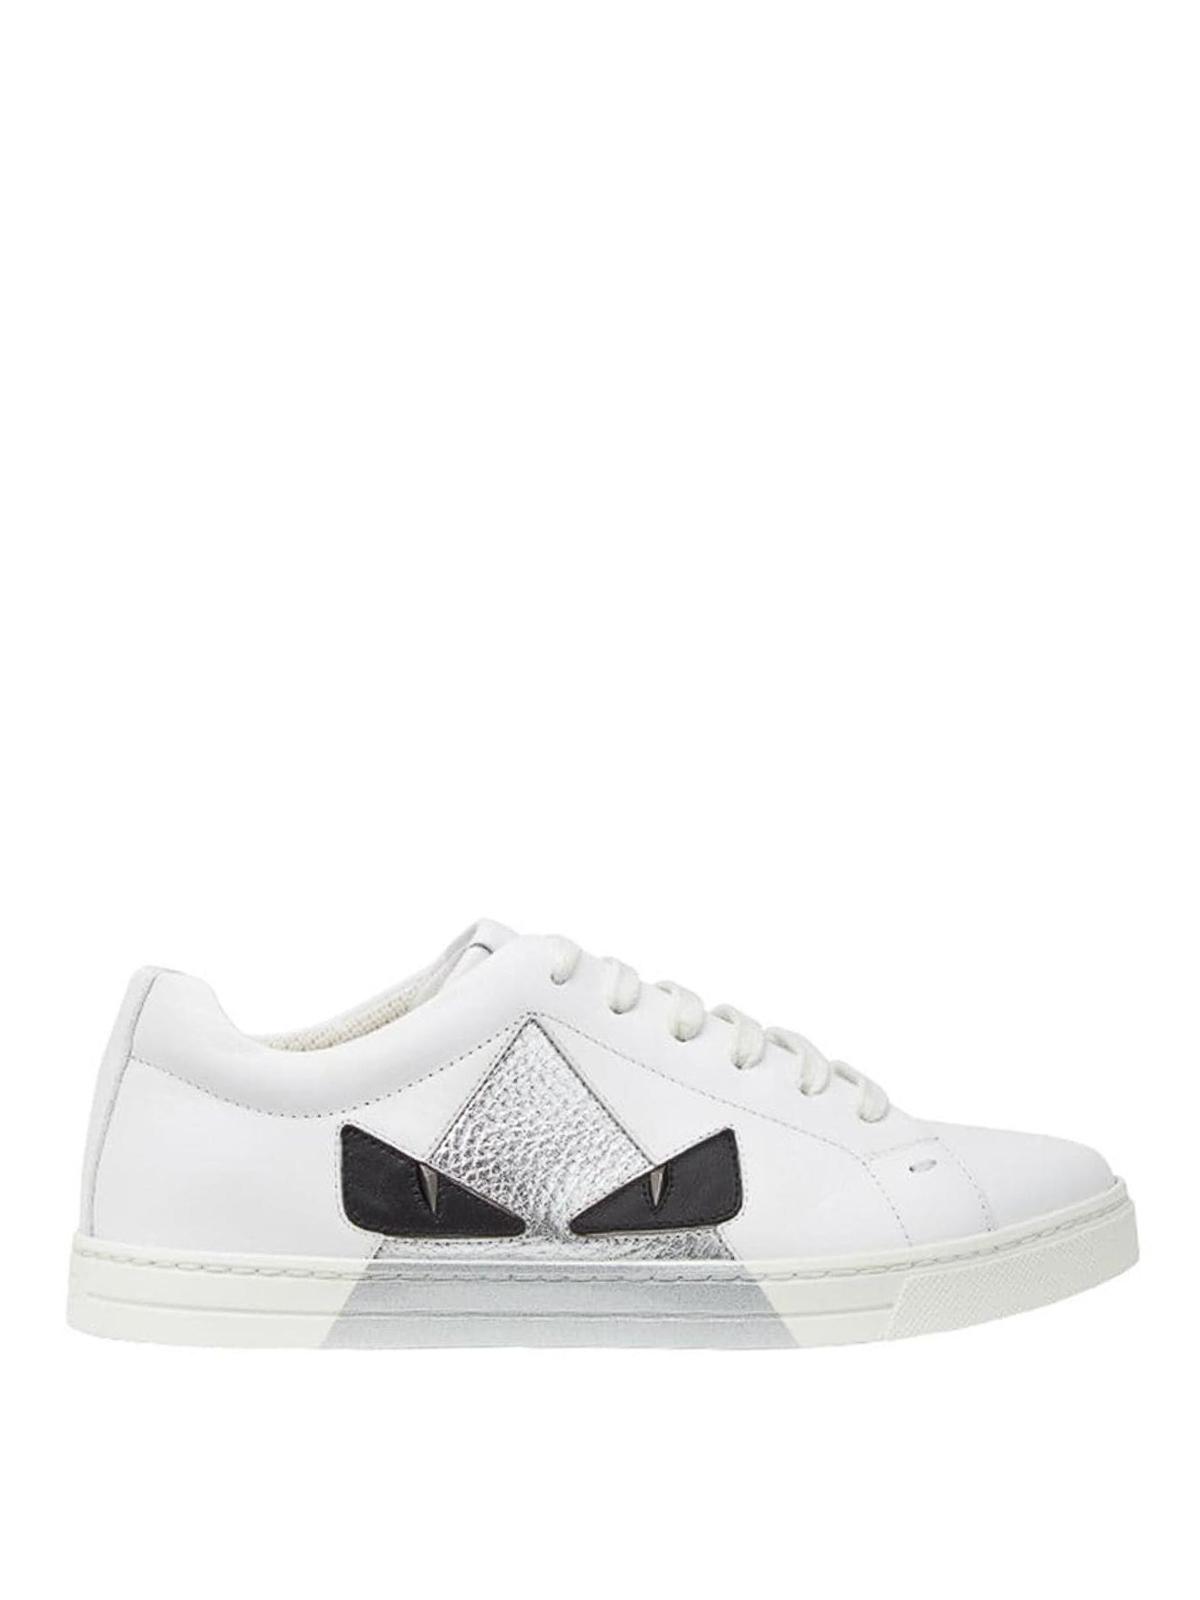 fendi eye sneakers